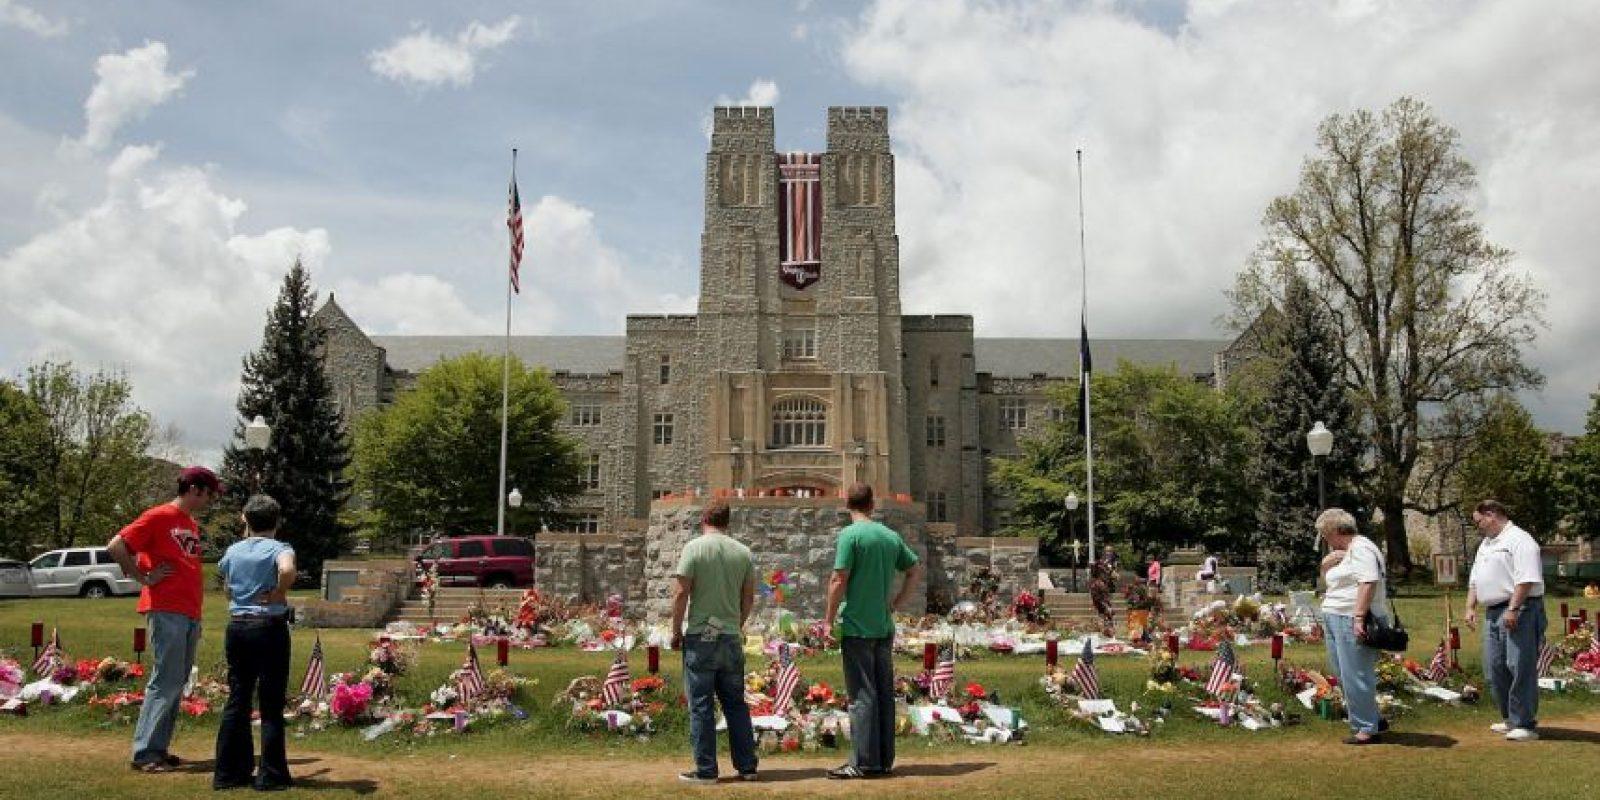 2. Masacre de Virginia Tech Foto:Getty Images